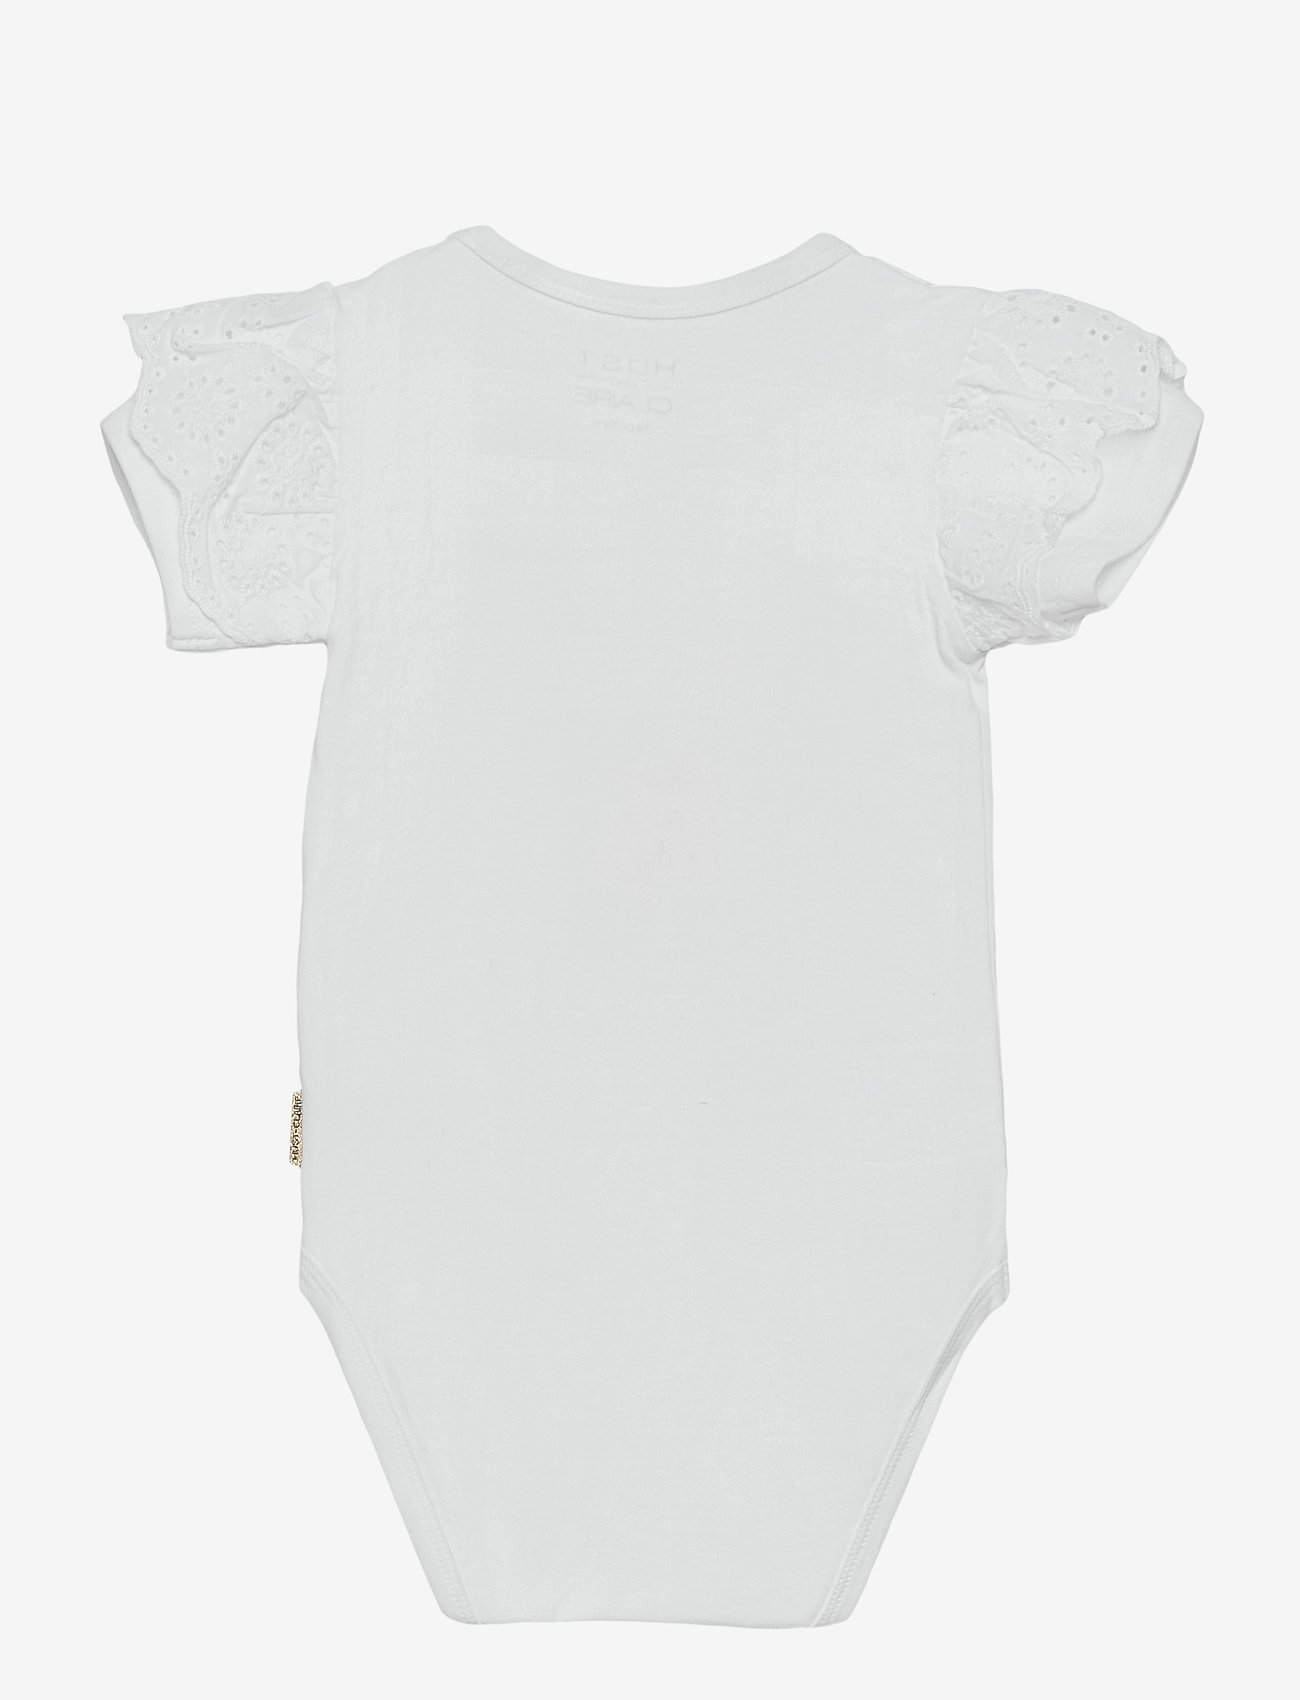 Hust & Claire - Beline - Bodystocking - kurzärmelige - white - 1